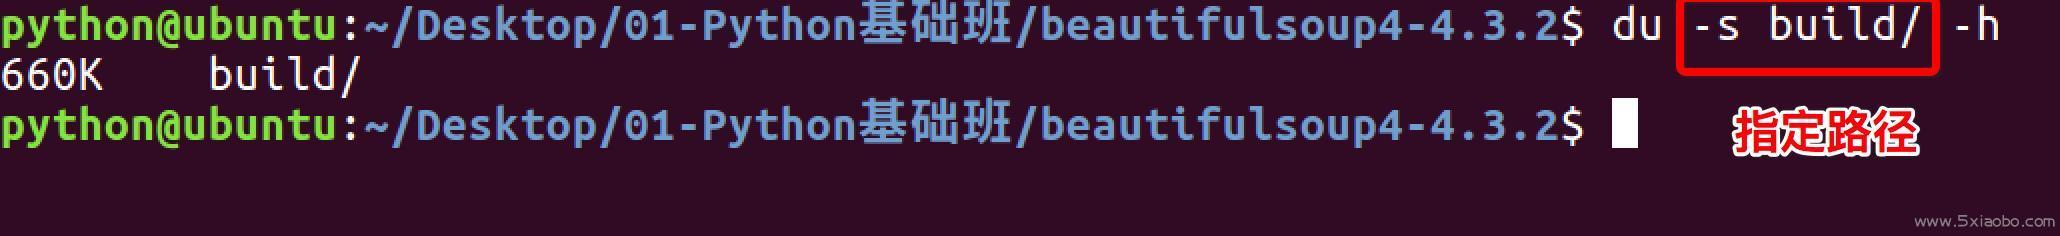 认识Linux命令--系统管理  Linux 命令 第15张